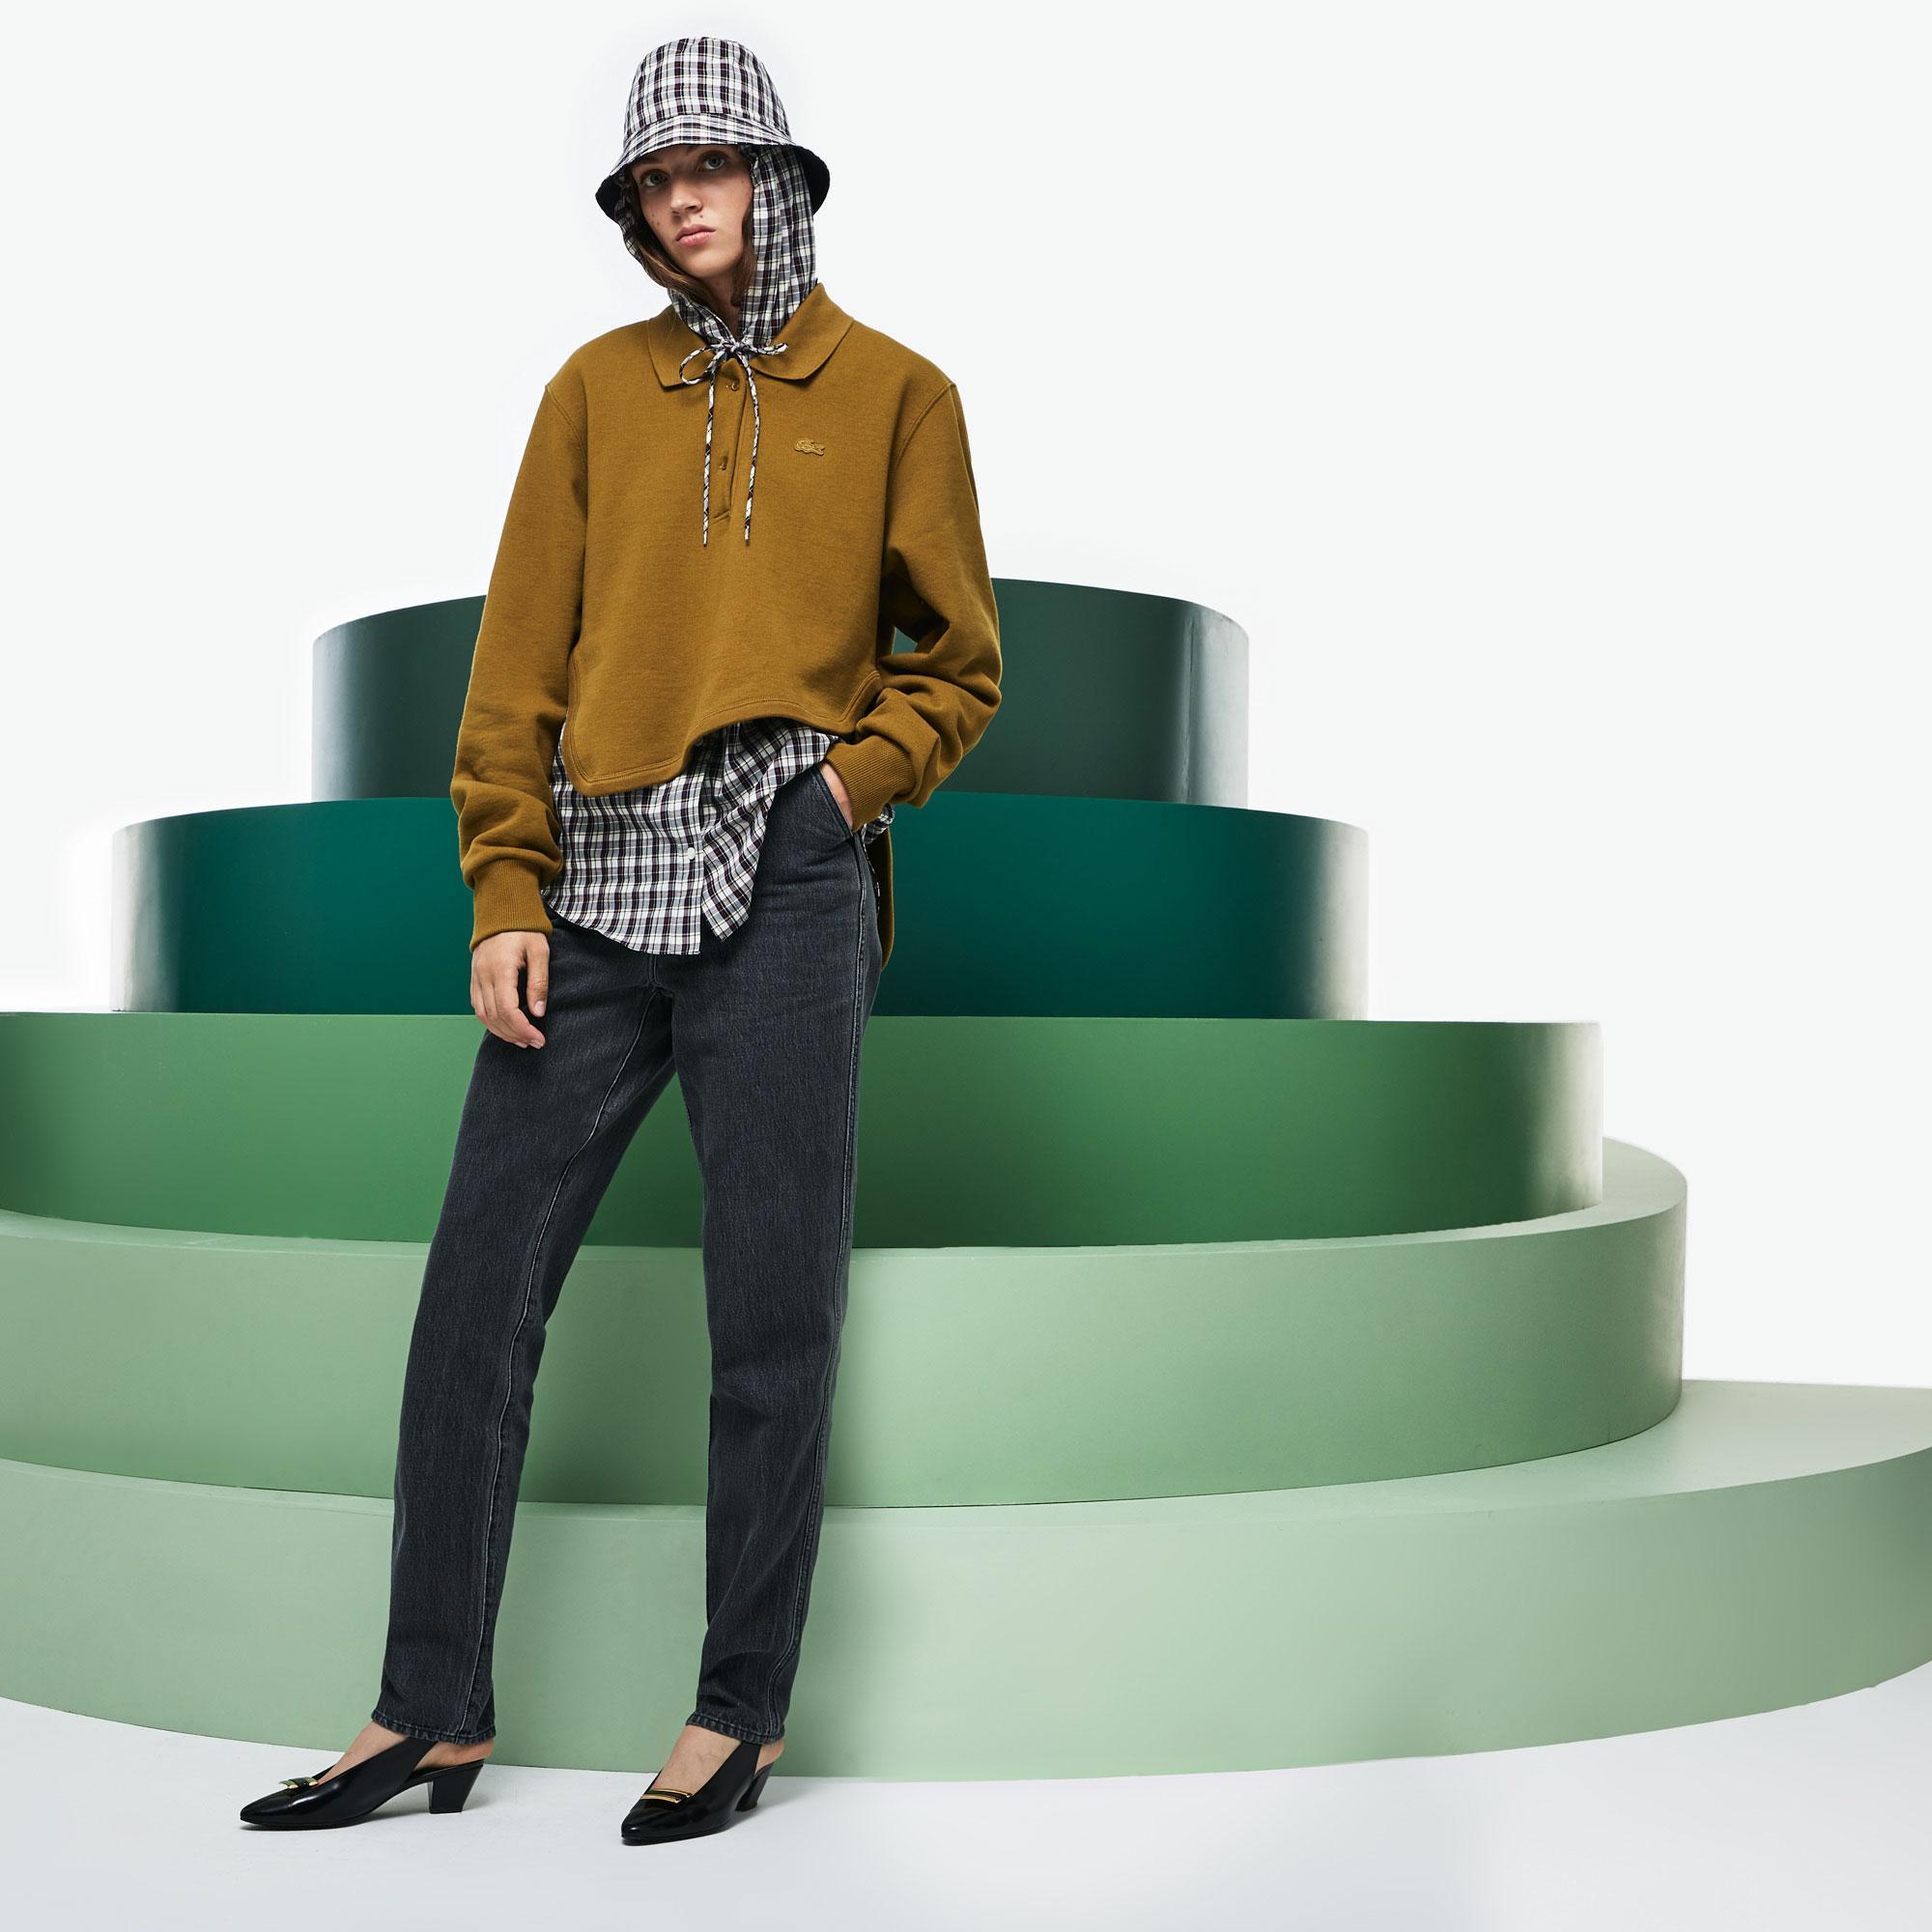 Lacoste Fashion Show Kadın Açık Kahverengi Polo